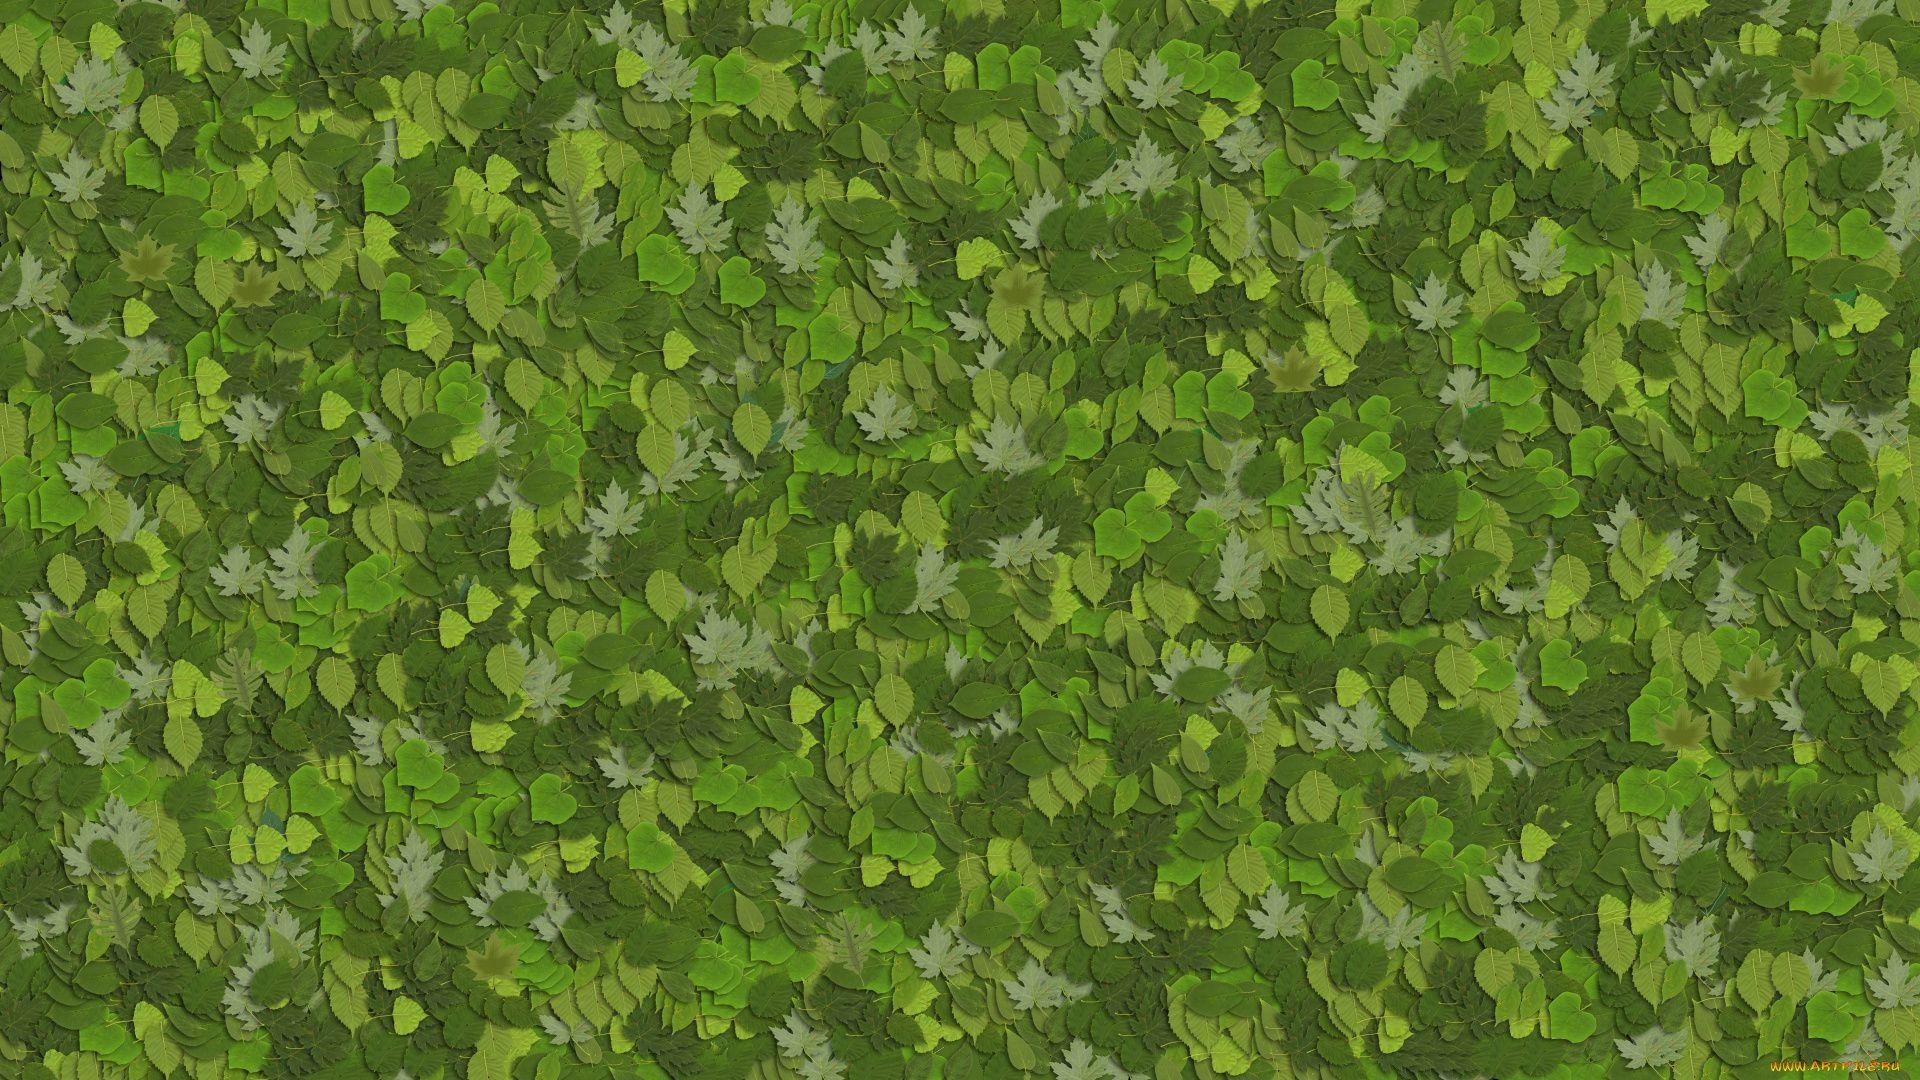 Leaf Pattern full hd wallpaper for laptop